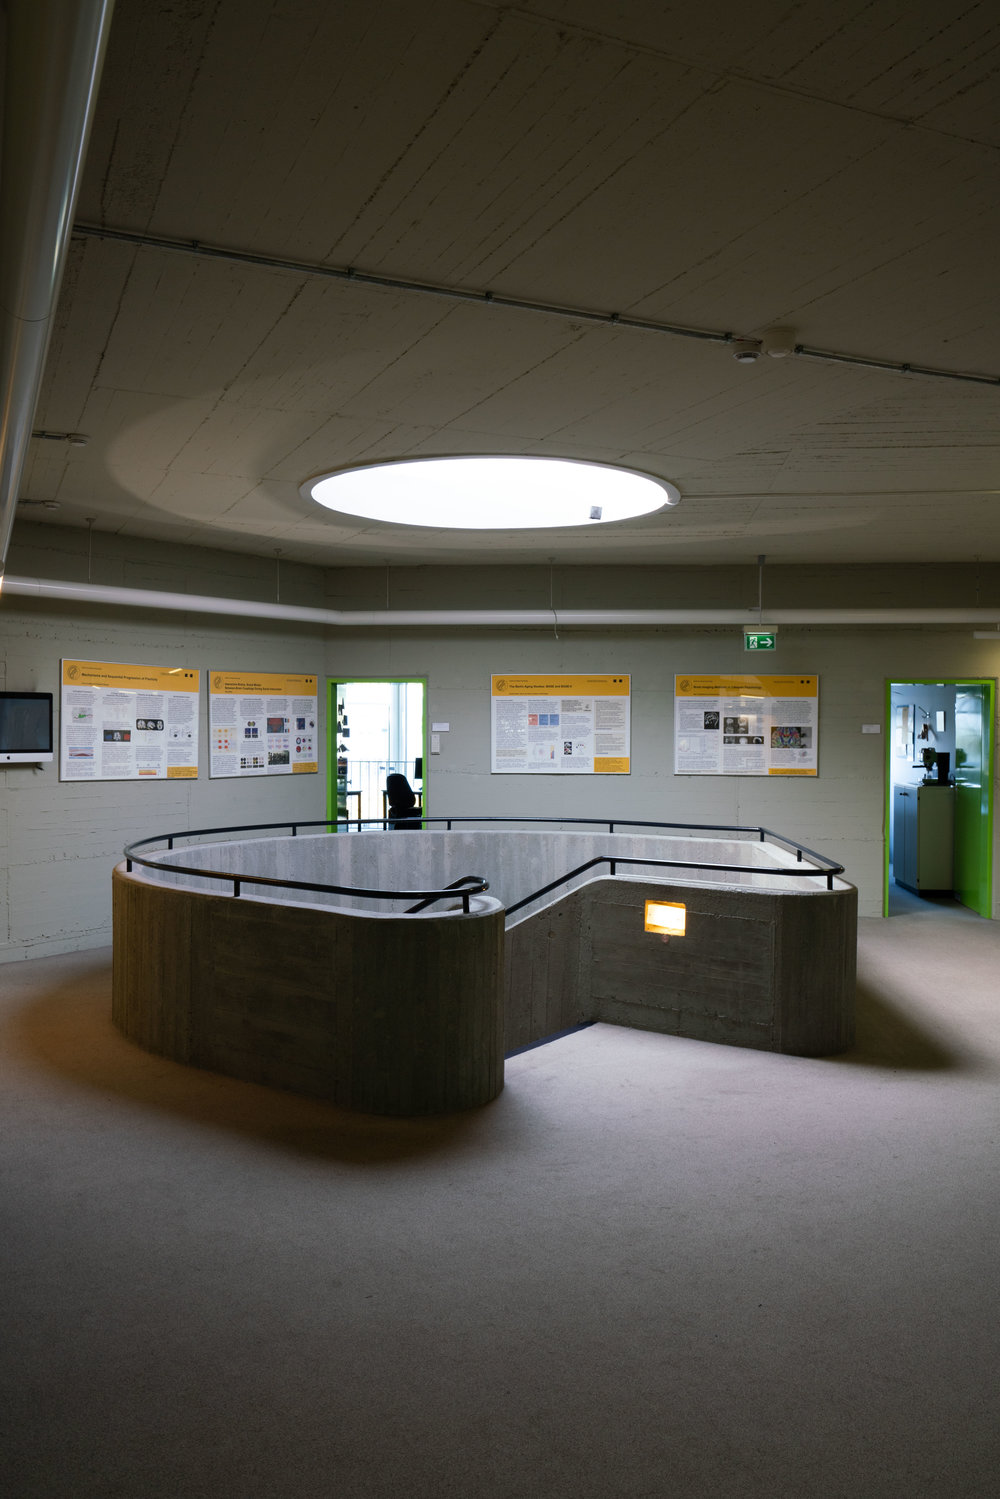 181012_Fehling+Gogel, Max Planck Institute_12.jpg